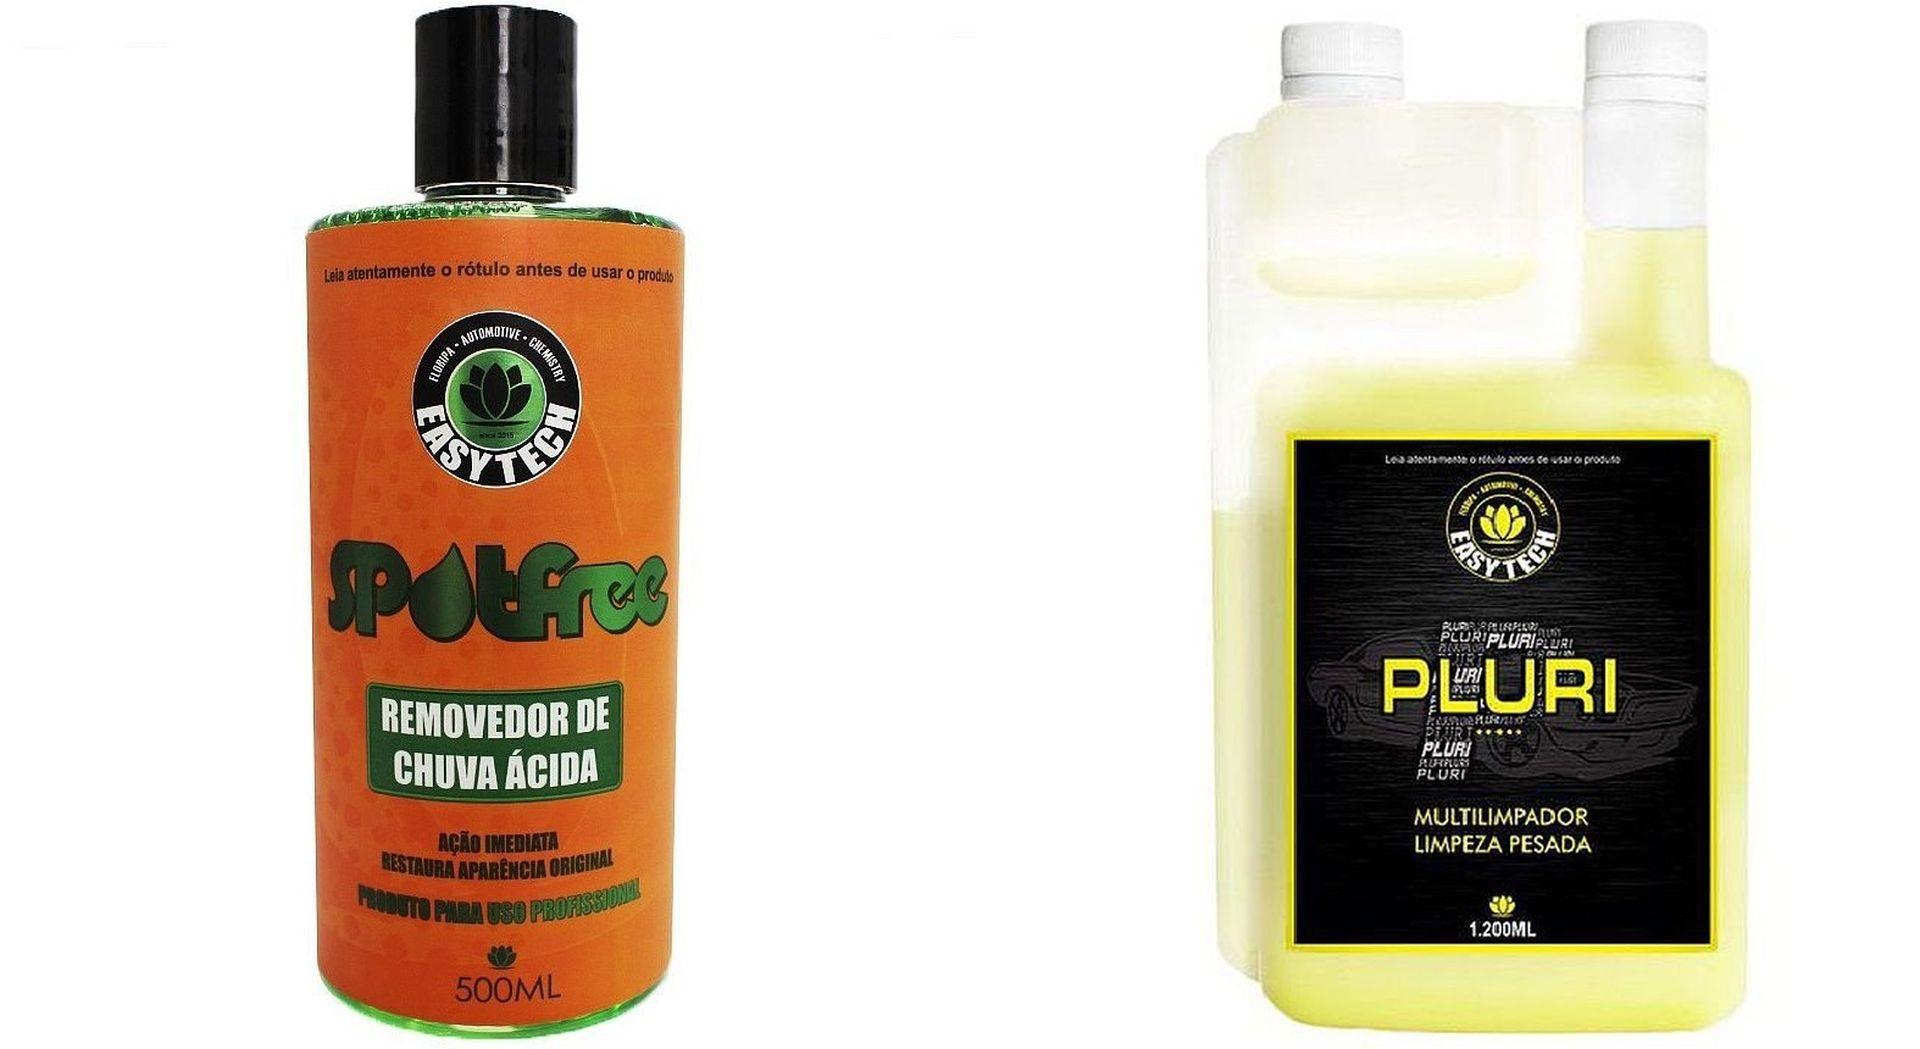 Kit Removedor de Chuva Acida Spotfree+ Apc 1-50 Pluri 1200